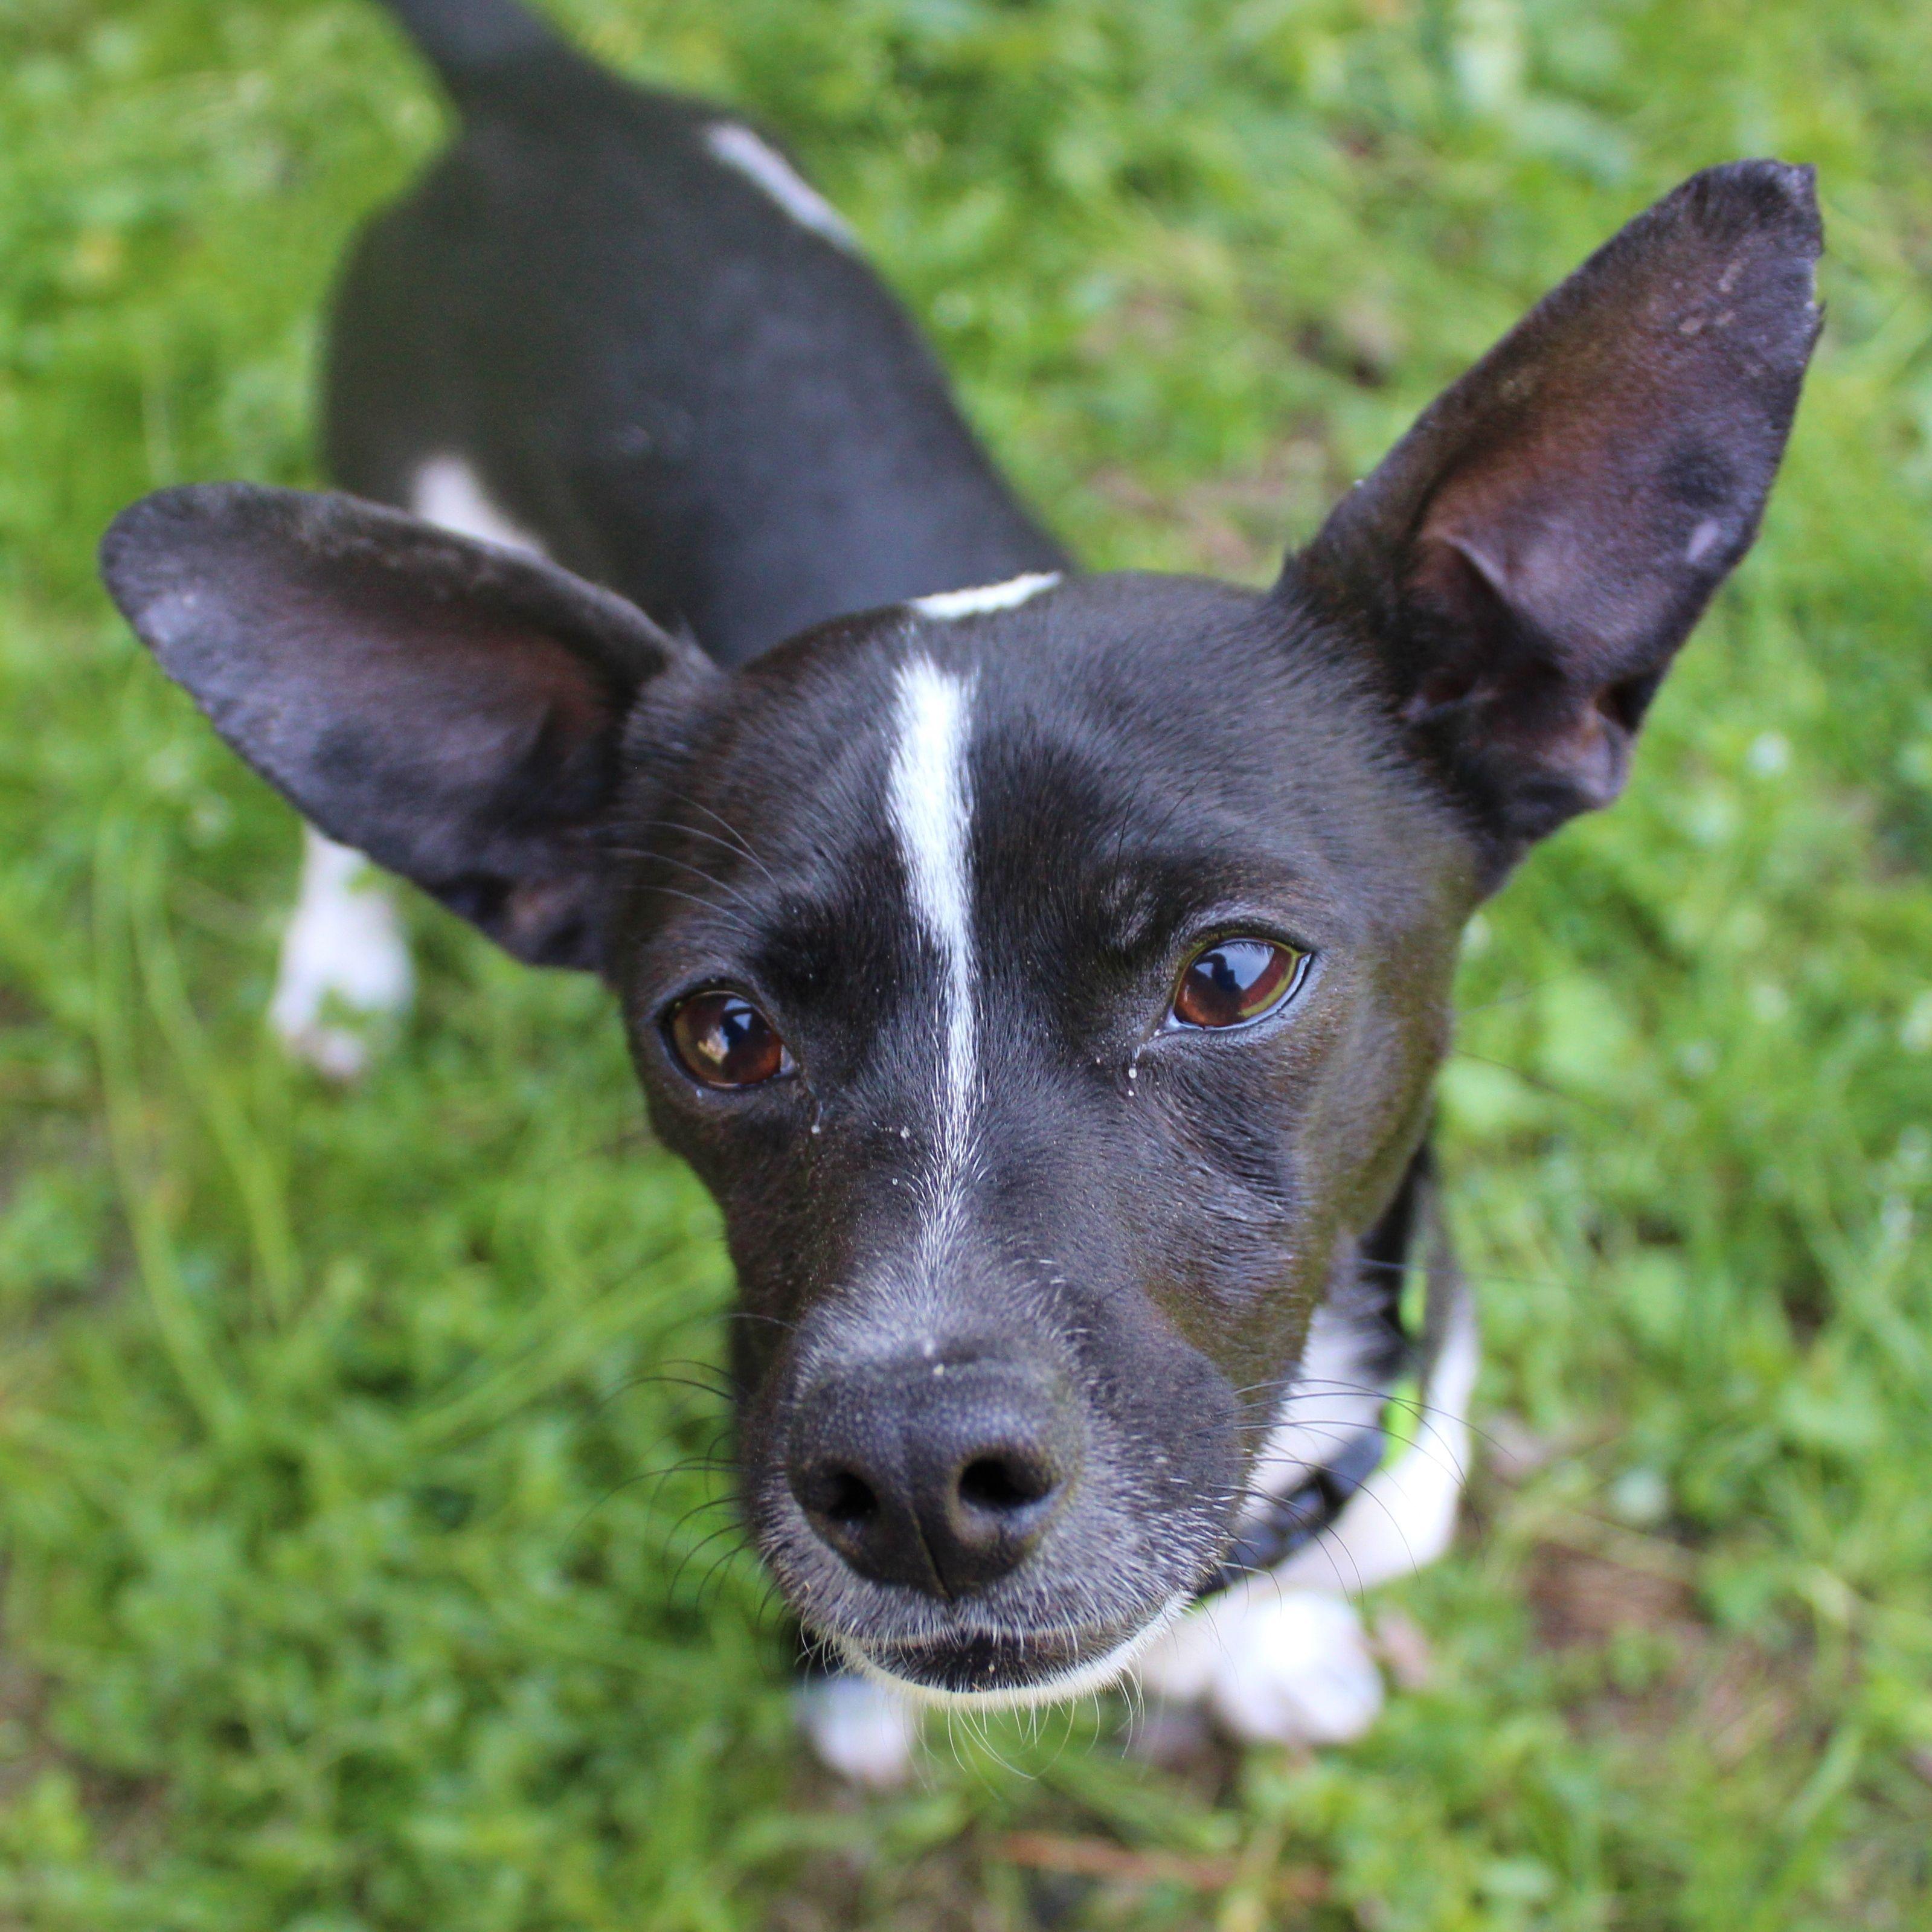 Rat Terrier dog for Adoption in Atlanta, GA. ADN405103 on